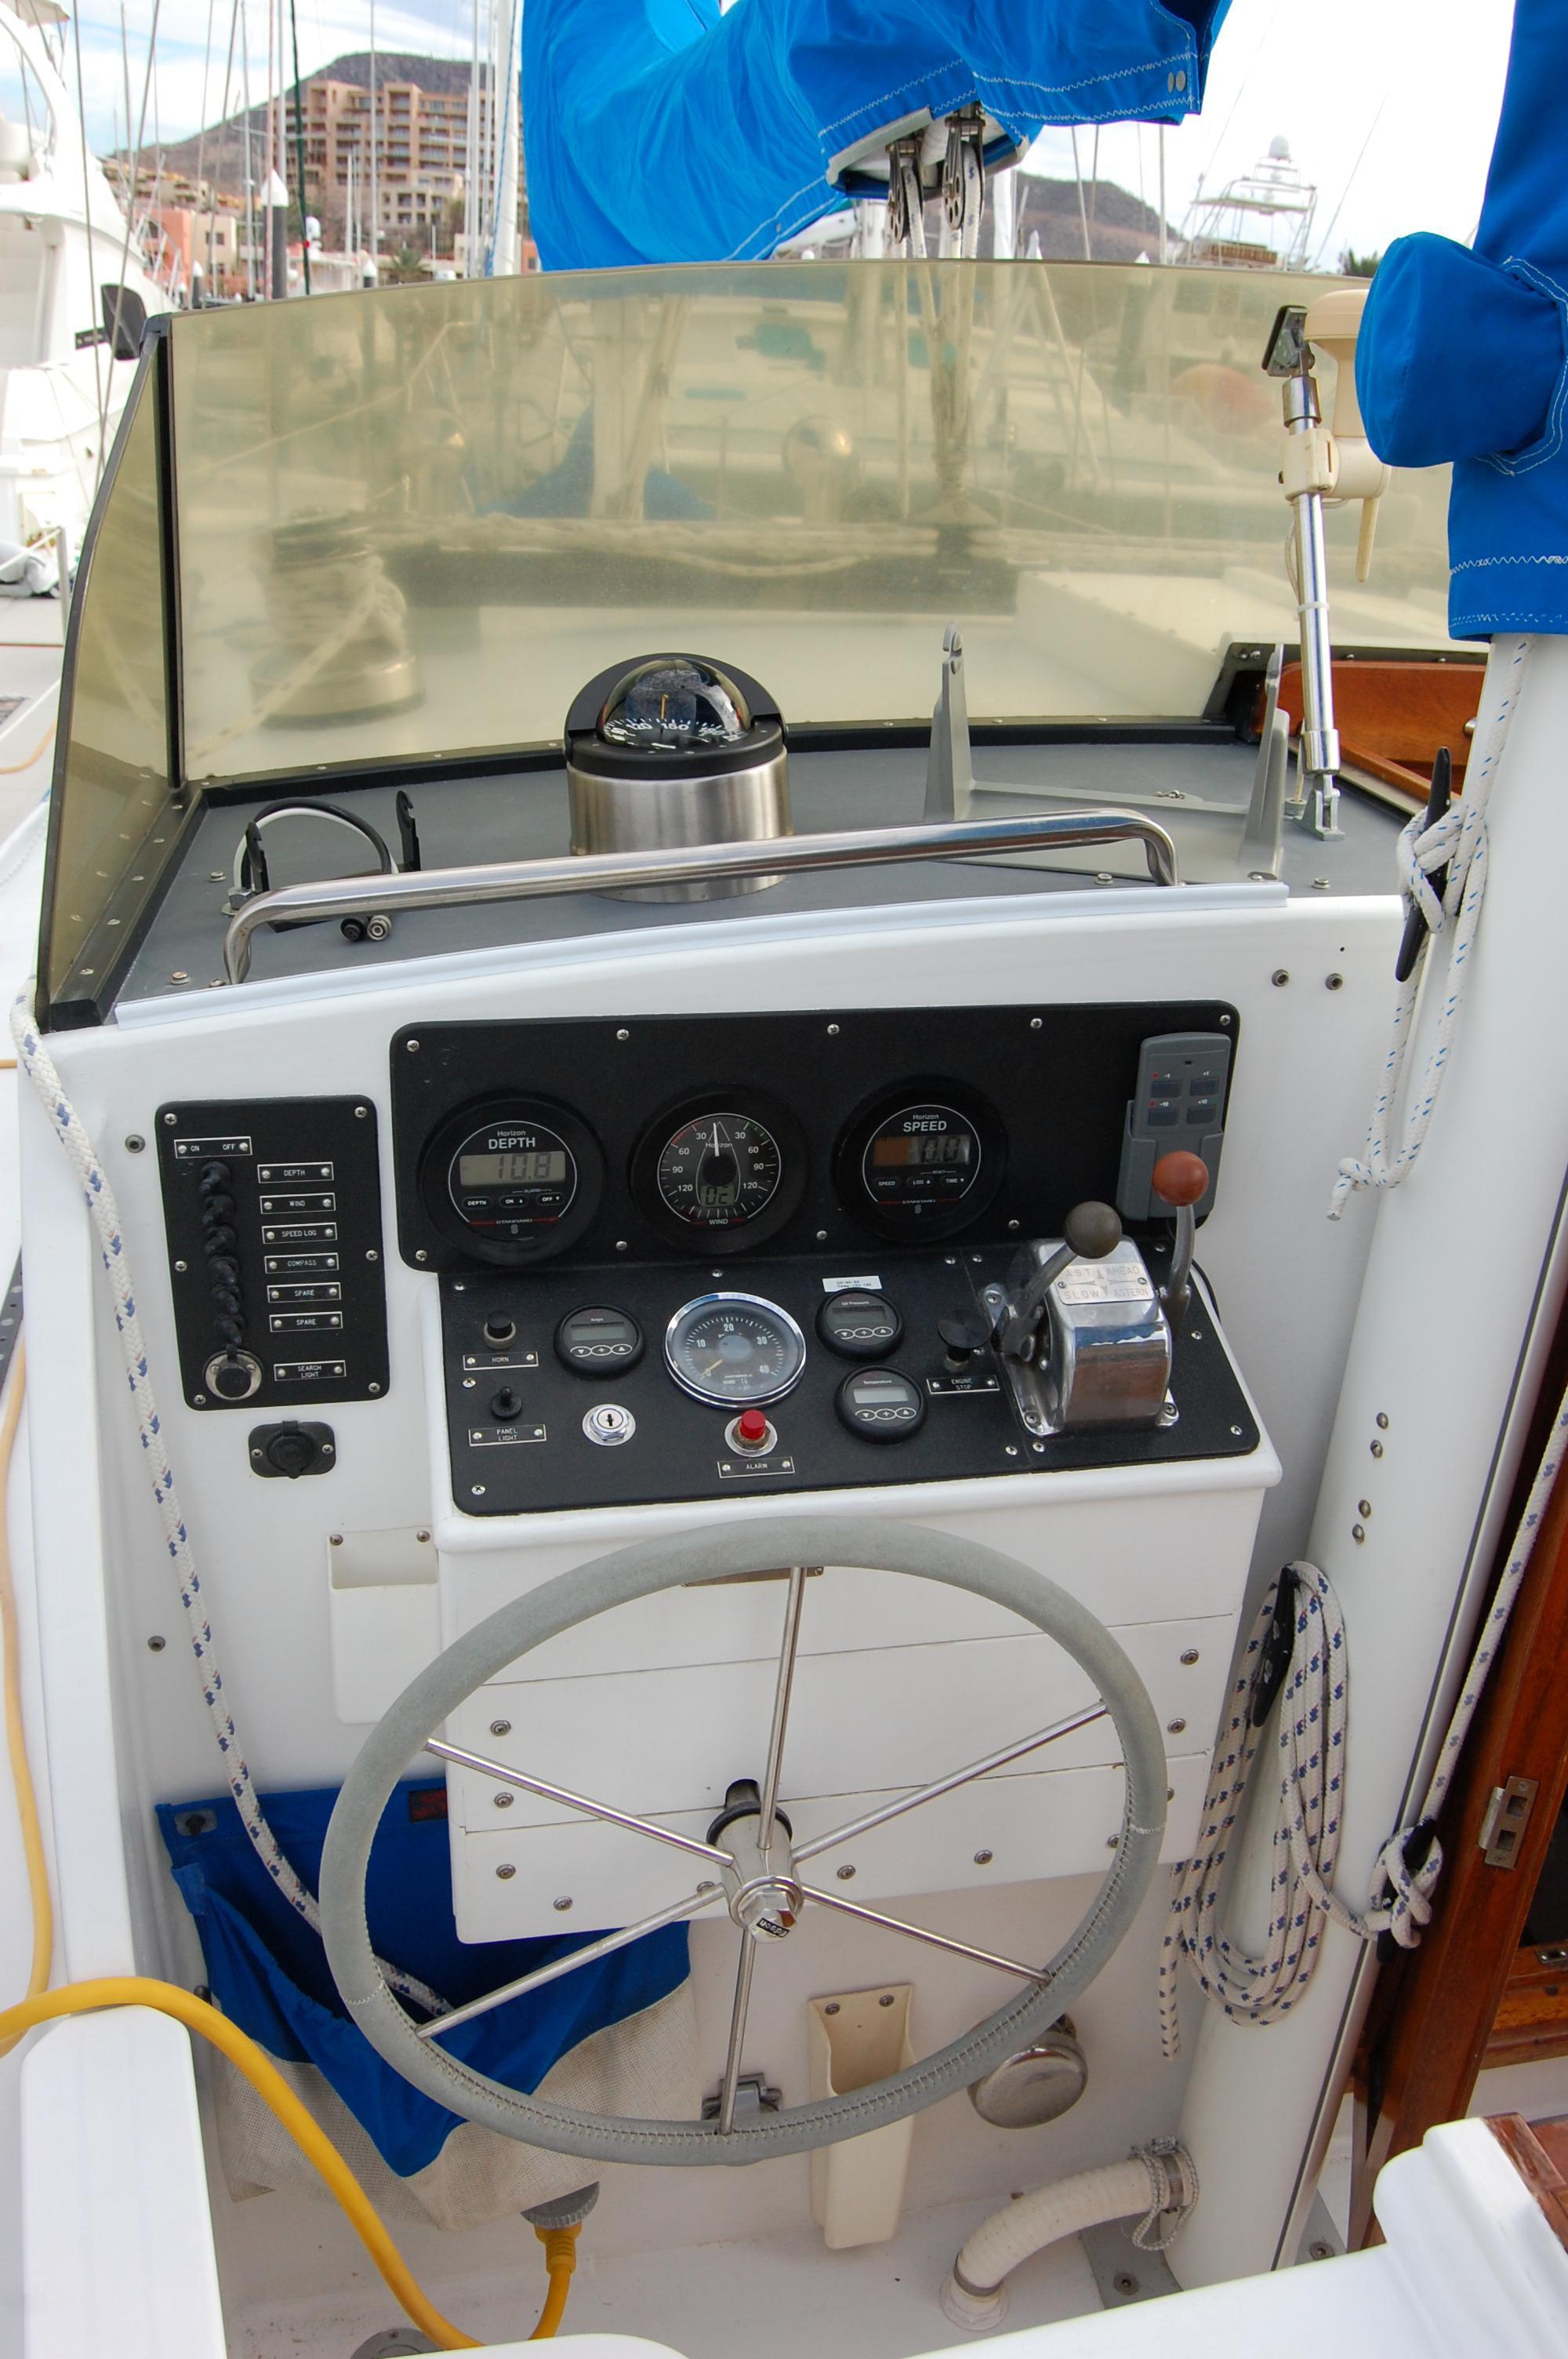 44' Custom C-Smoke Ferrocement Ketch+Deck between aft cabin and salon